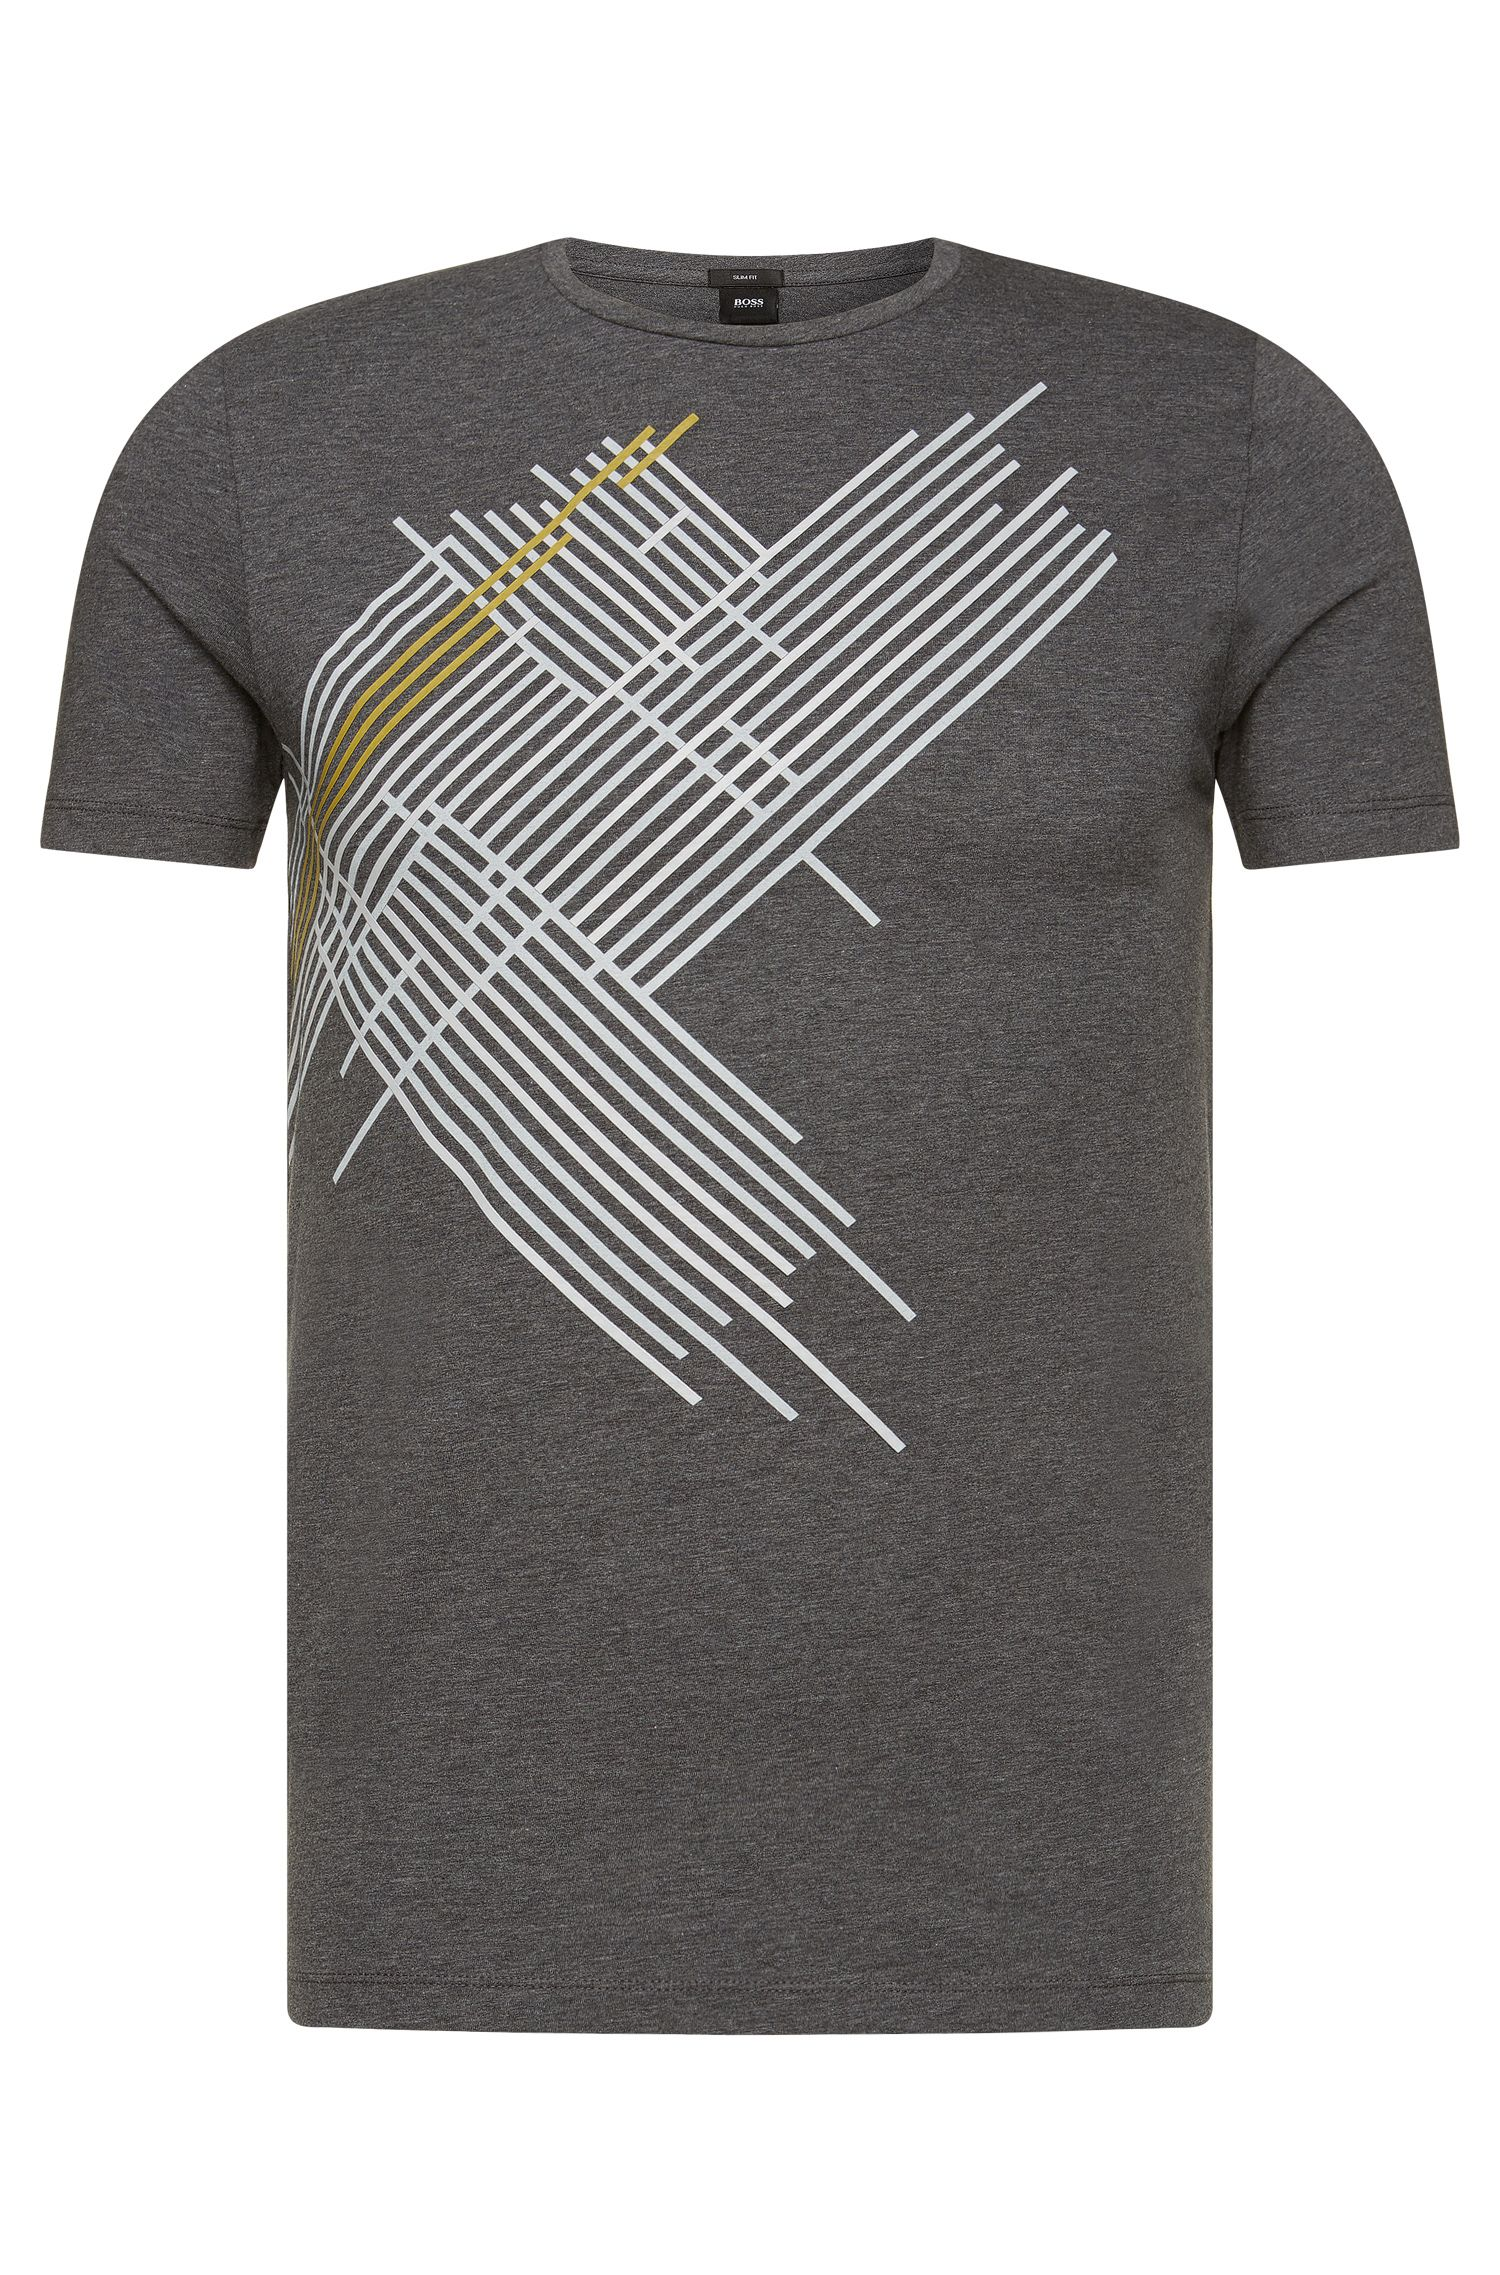 Bedrucktes Slim-Fit T-Shirt aus Baumwolle: 'Tessler 38'